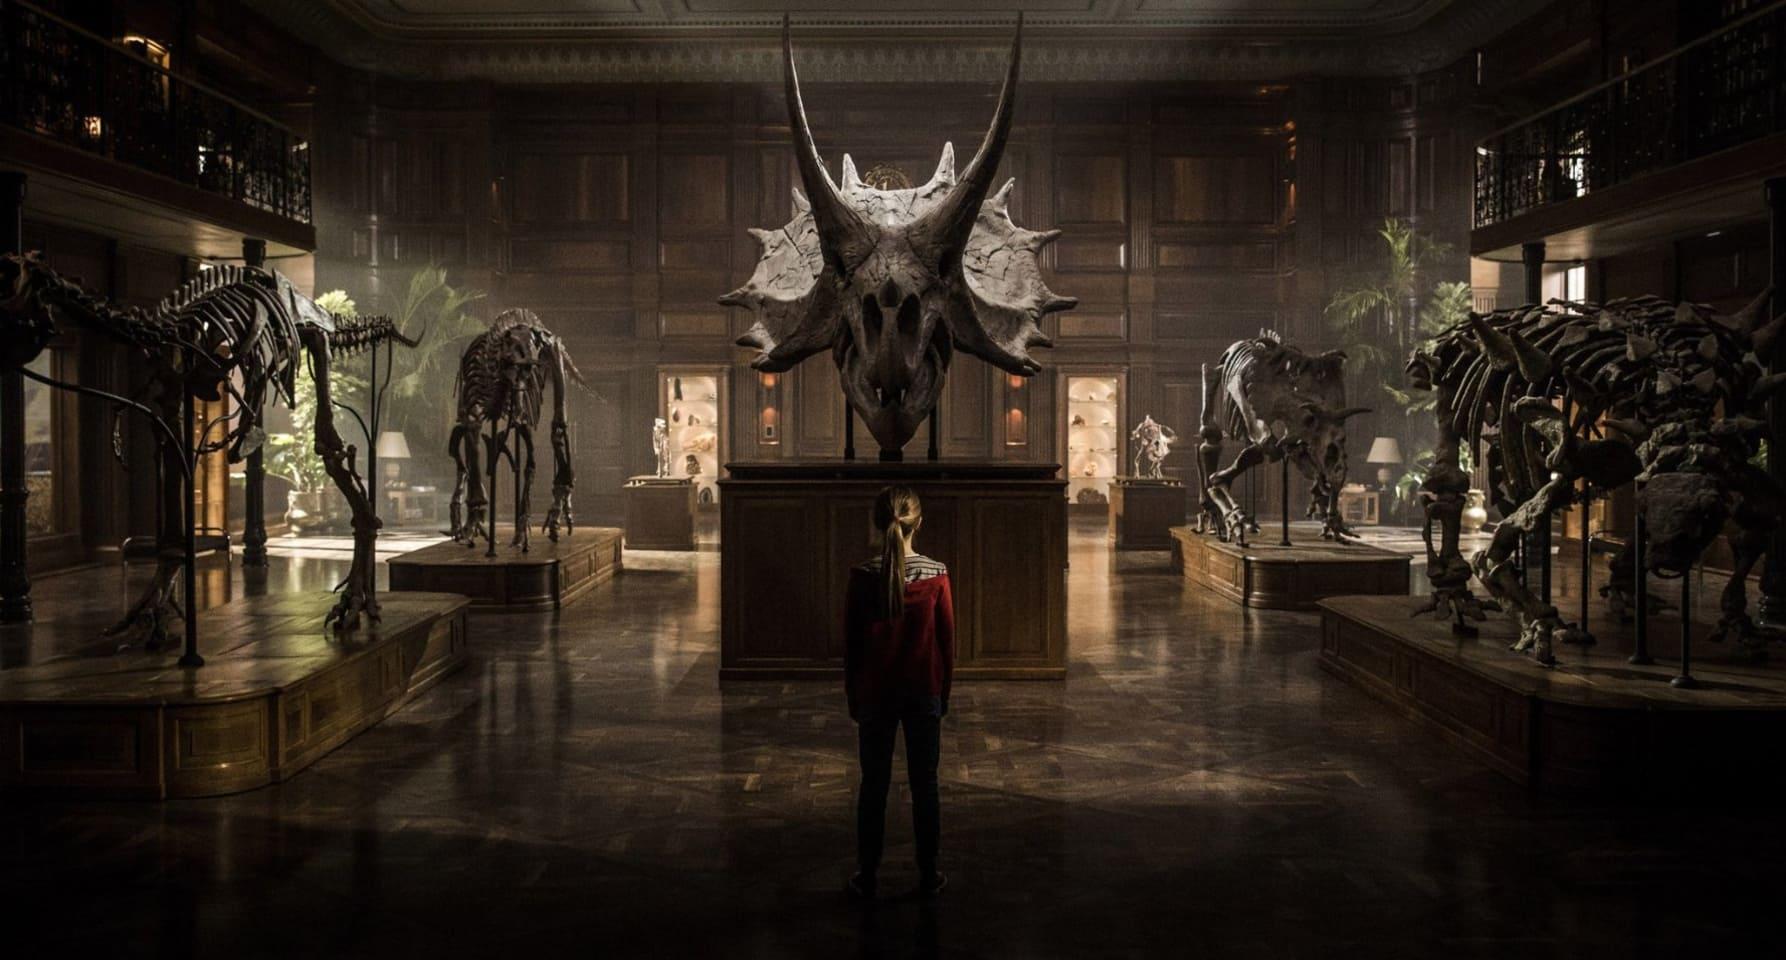 Jurassic World: Fallen Kingdom Tickets, Showtimes & Reviews